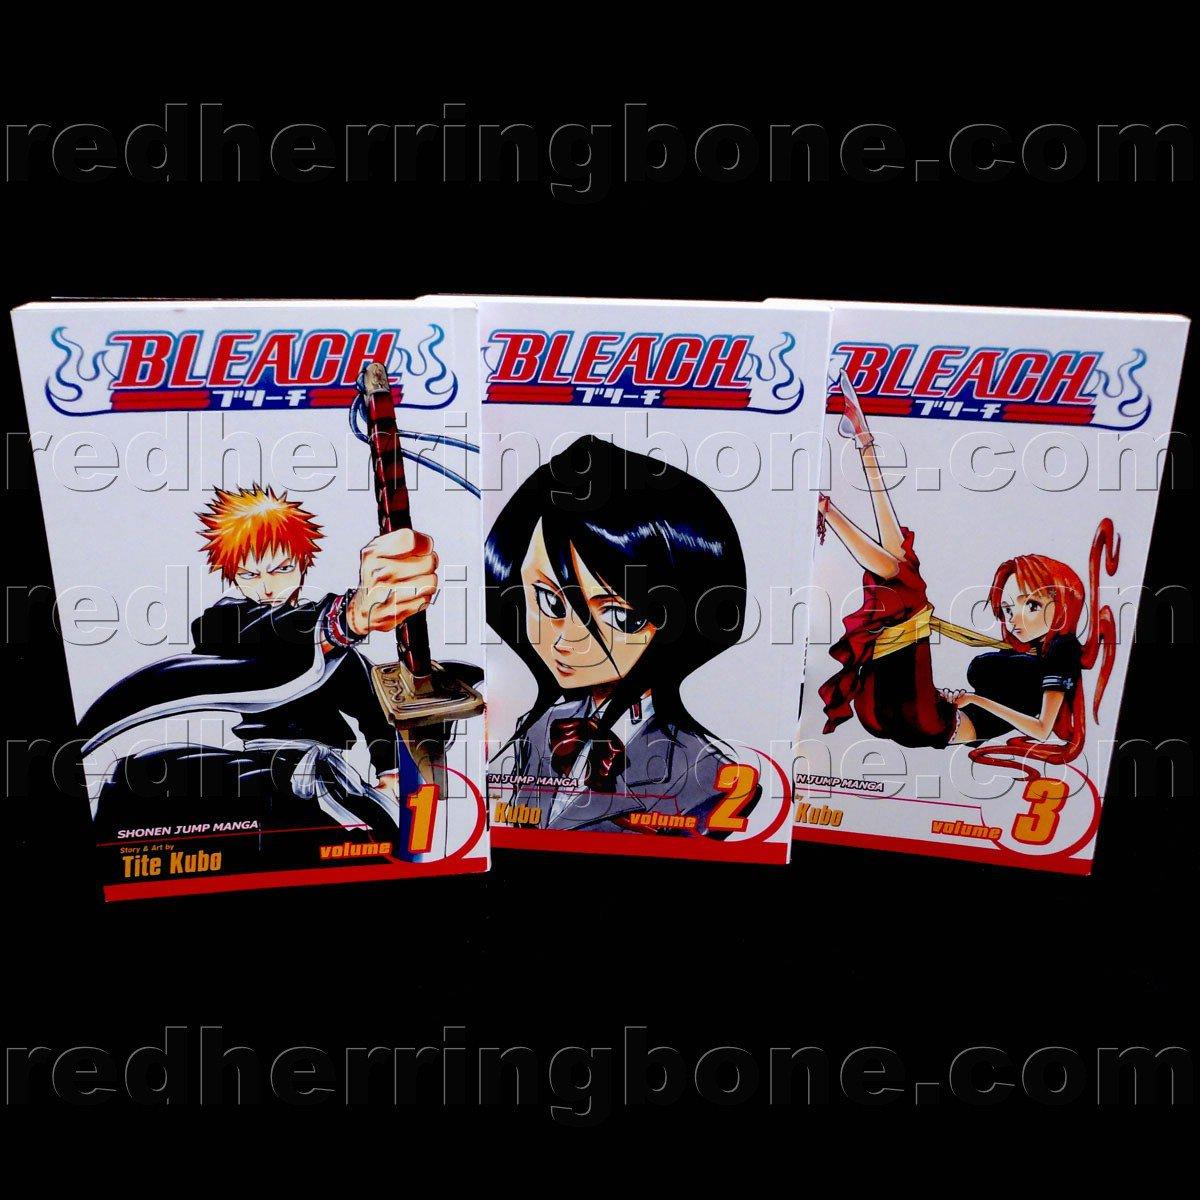 Bleach, Vol. 1-3 Manga (set includes Volume 1, 2 & 3) Tite Kubo NEW